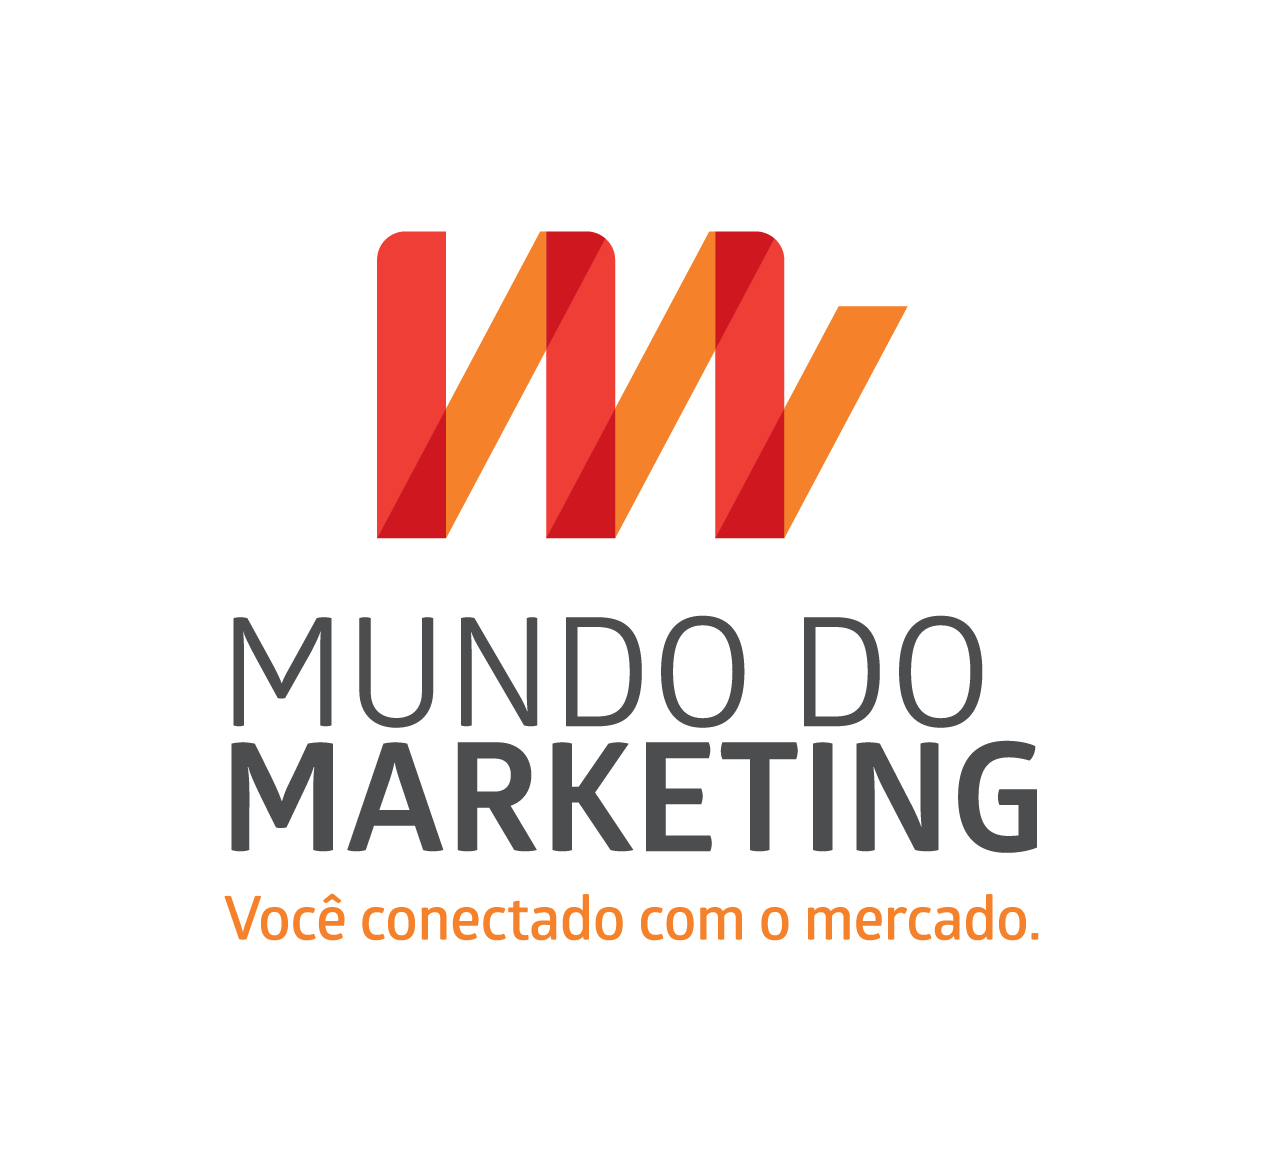 Mundo do Marketing apoiador Email Marketing Summit